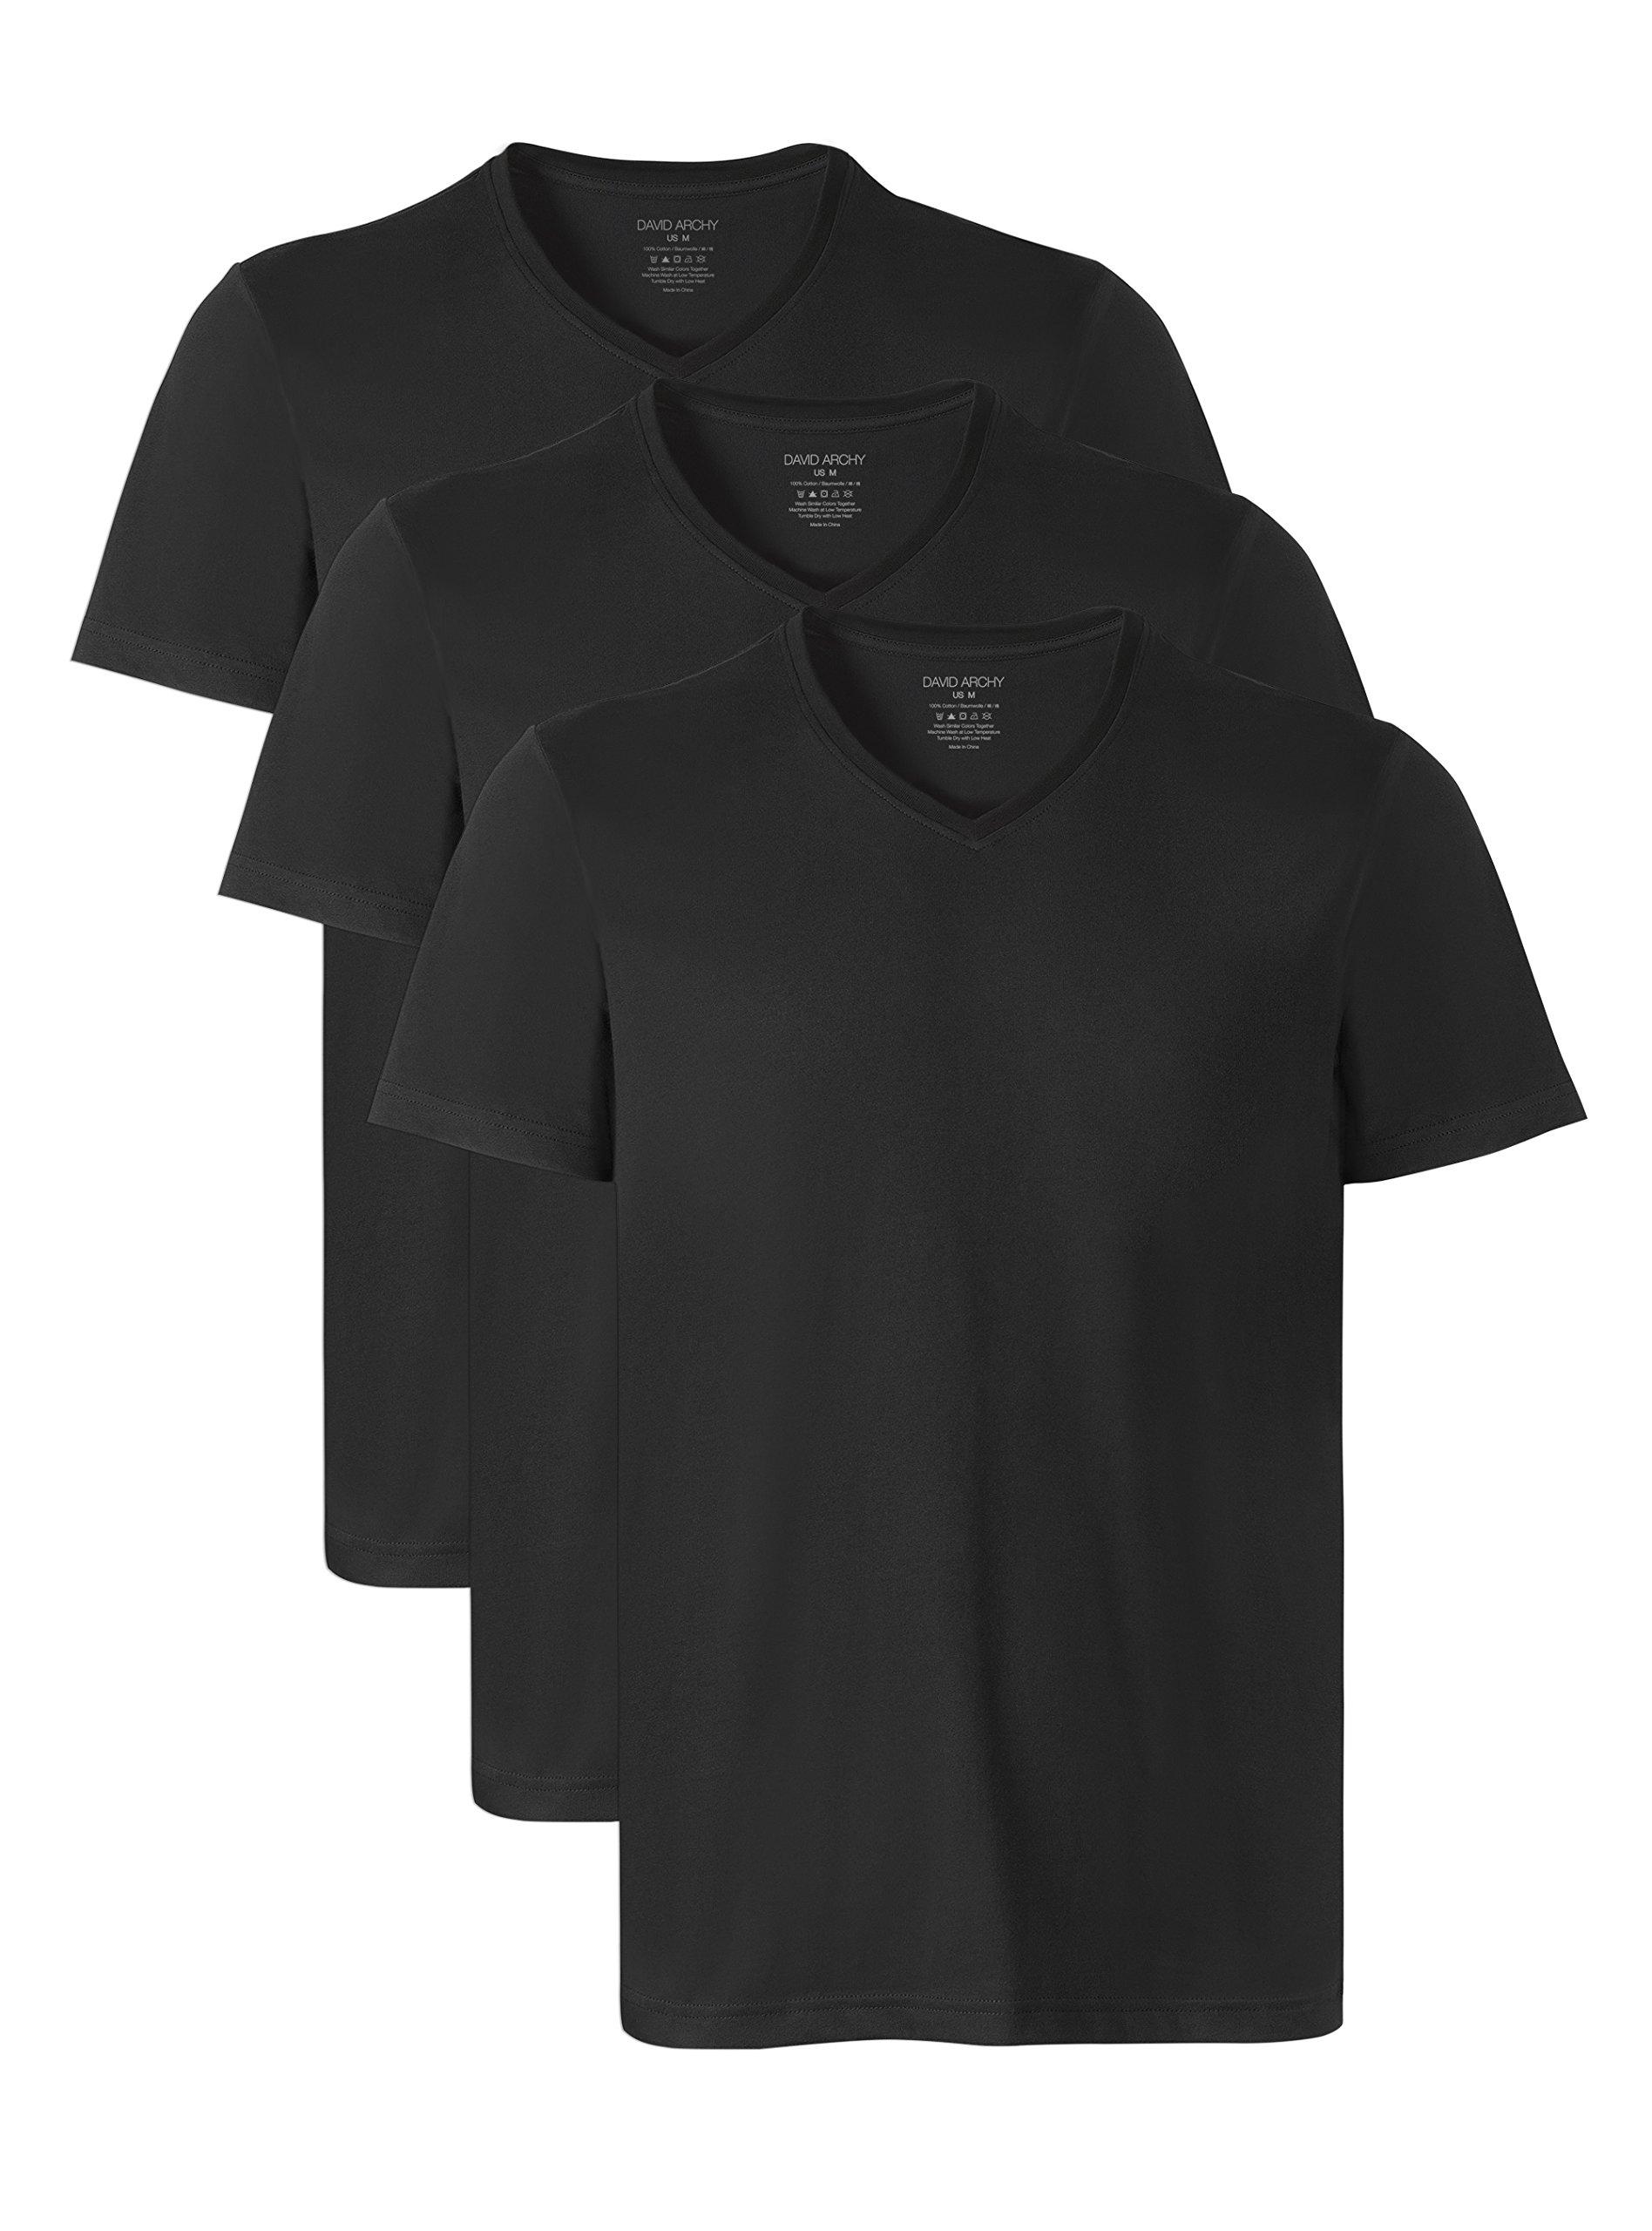 David Archy Men's Short Sleeve V-Neck Cotton Undershirts T-Shirts in 3 Pack (M, Black)